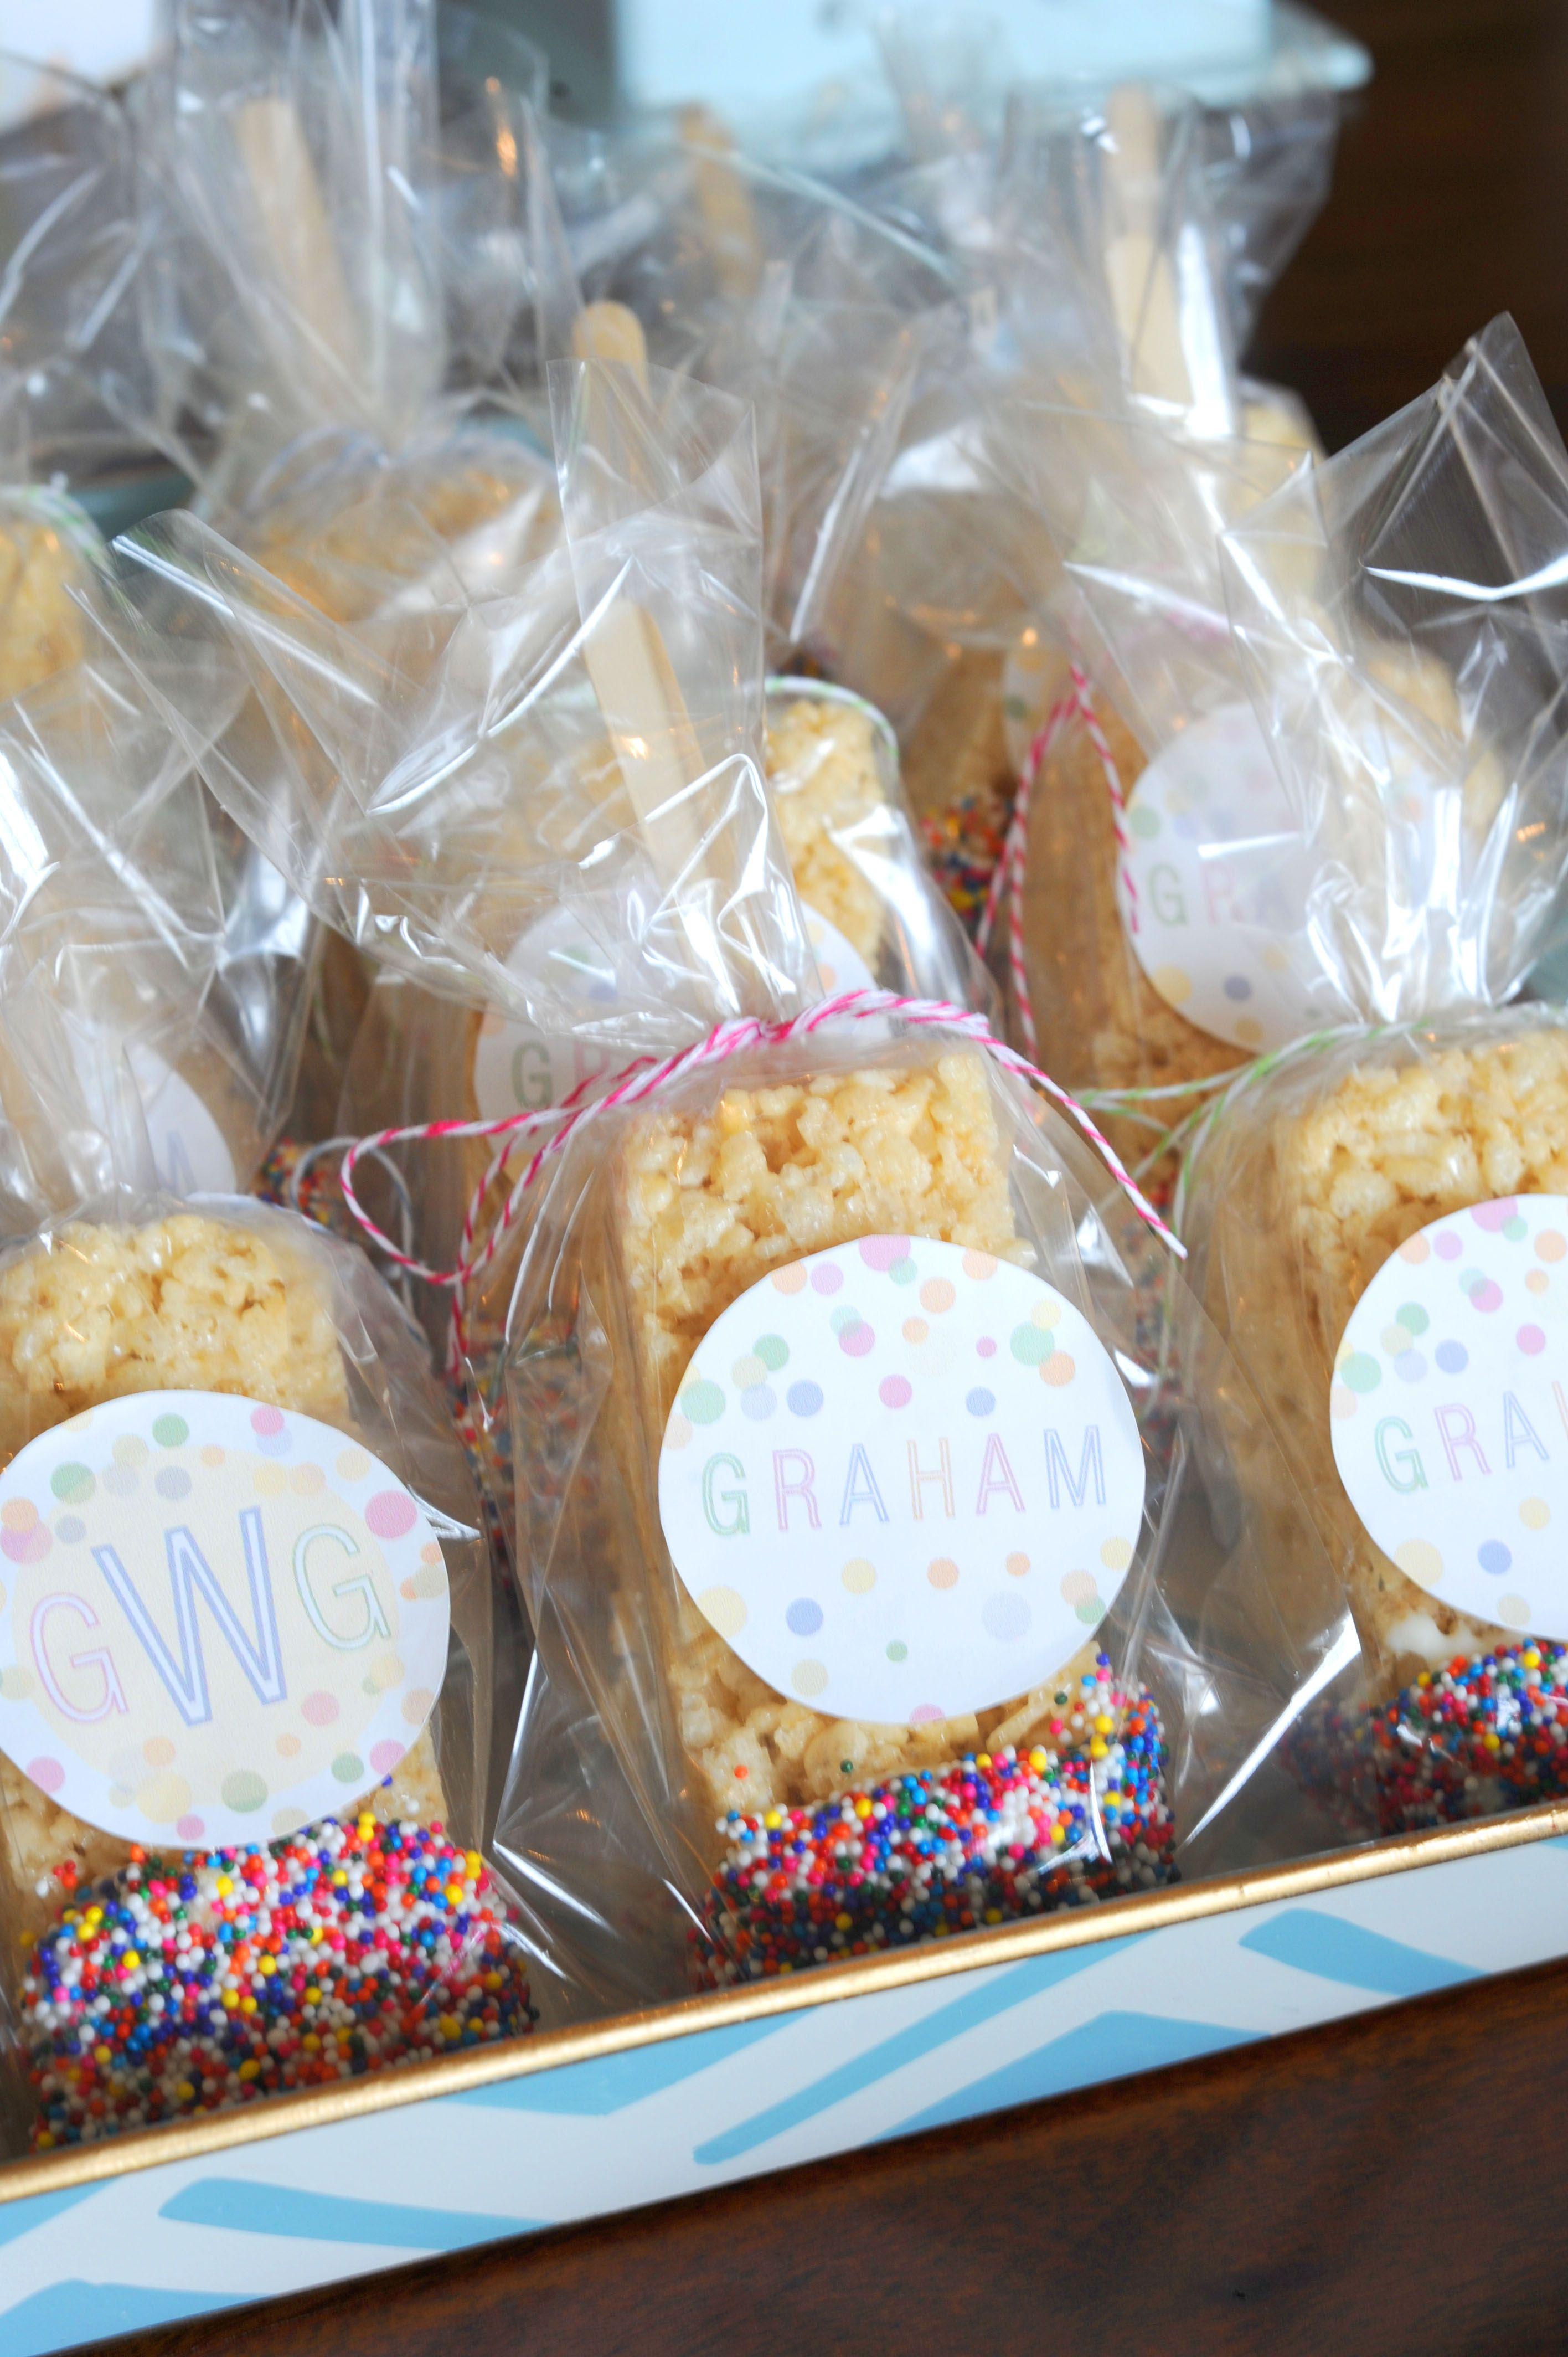 Baby shower rice krispy treat ideas - Baby Sprinkle Rice Krispies On A Stick Dipped In Sprinkles